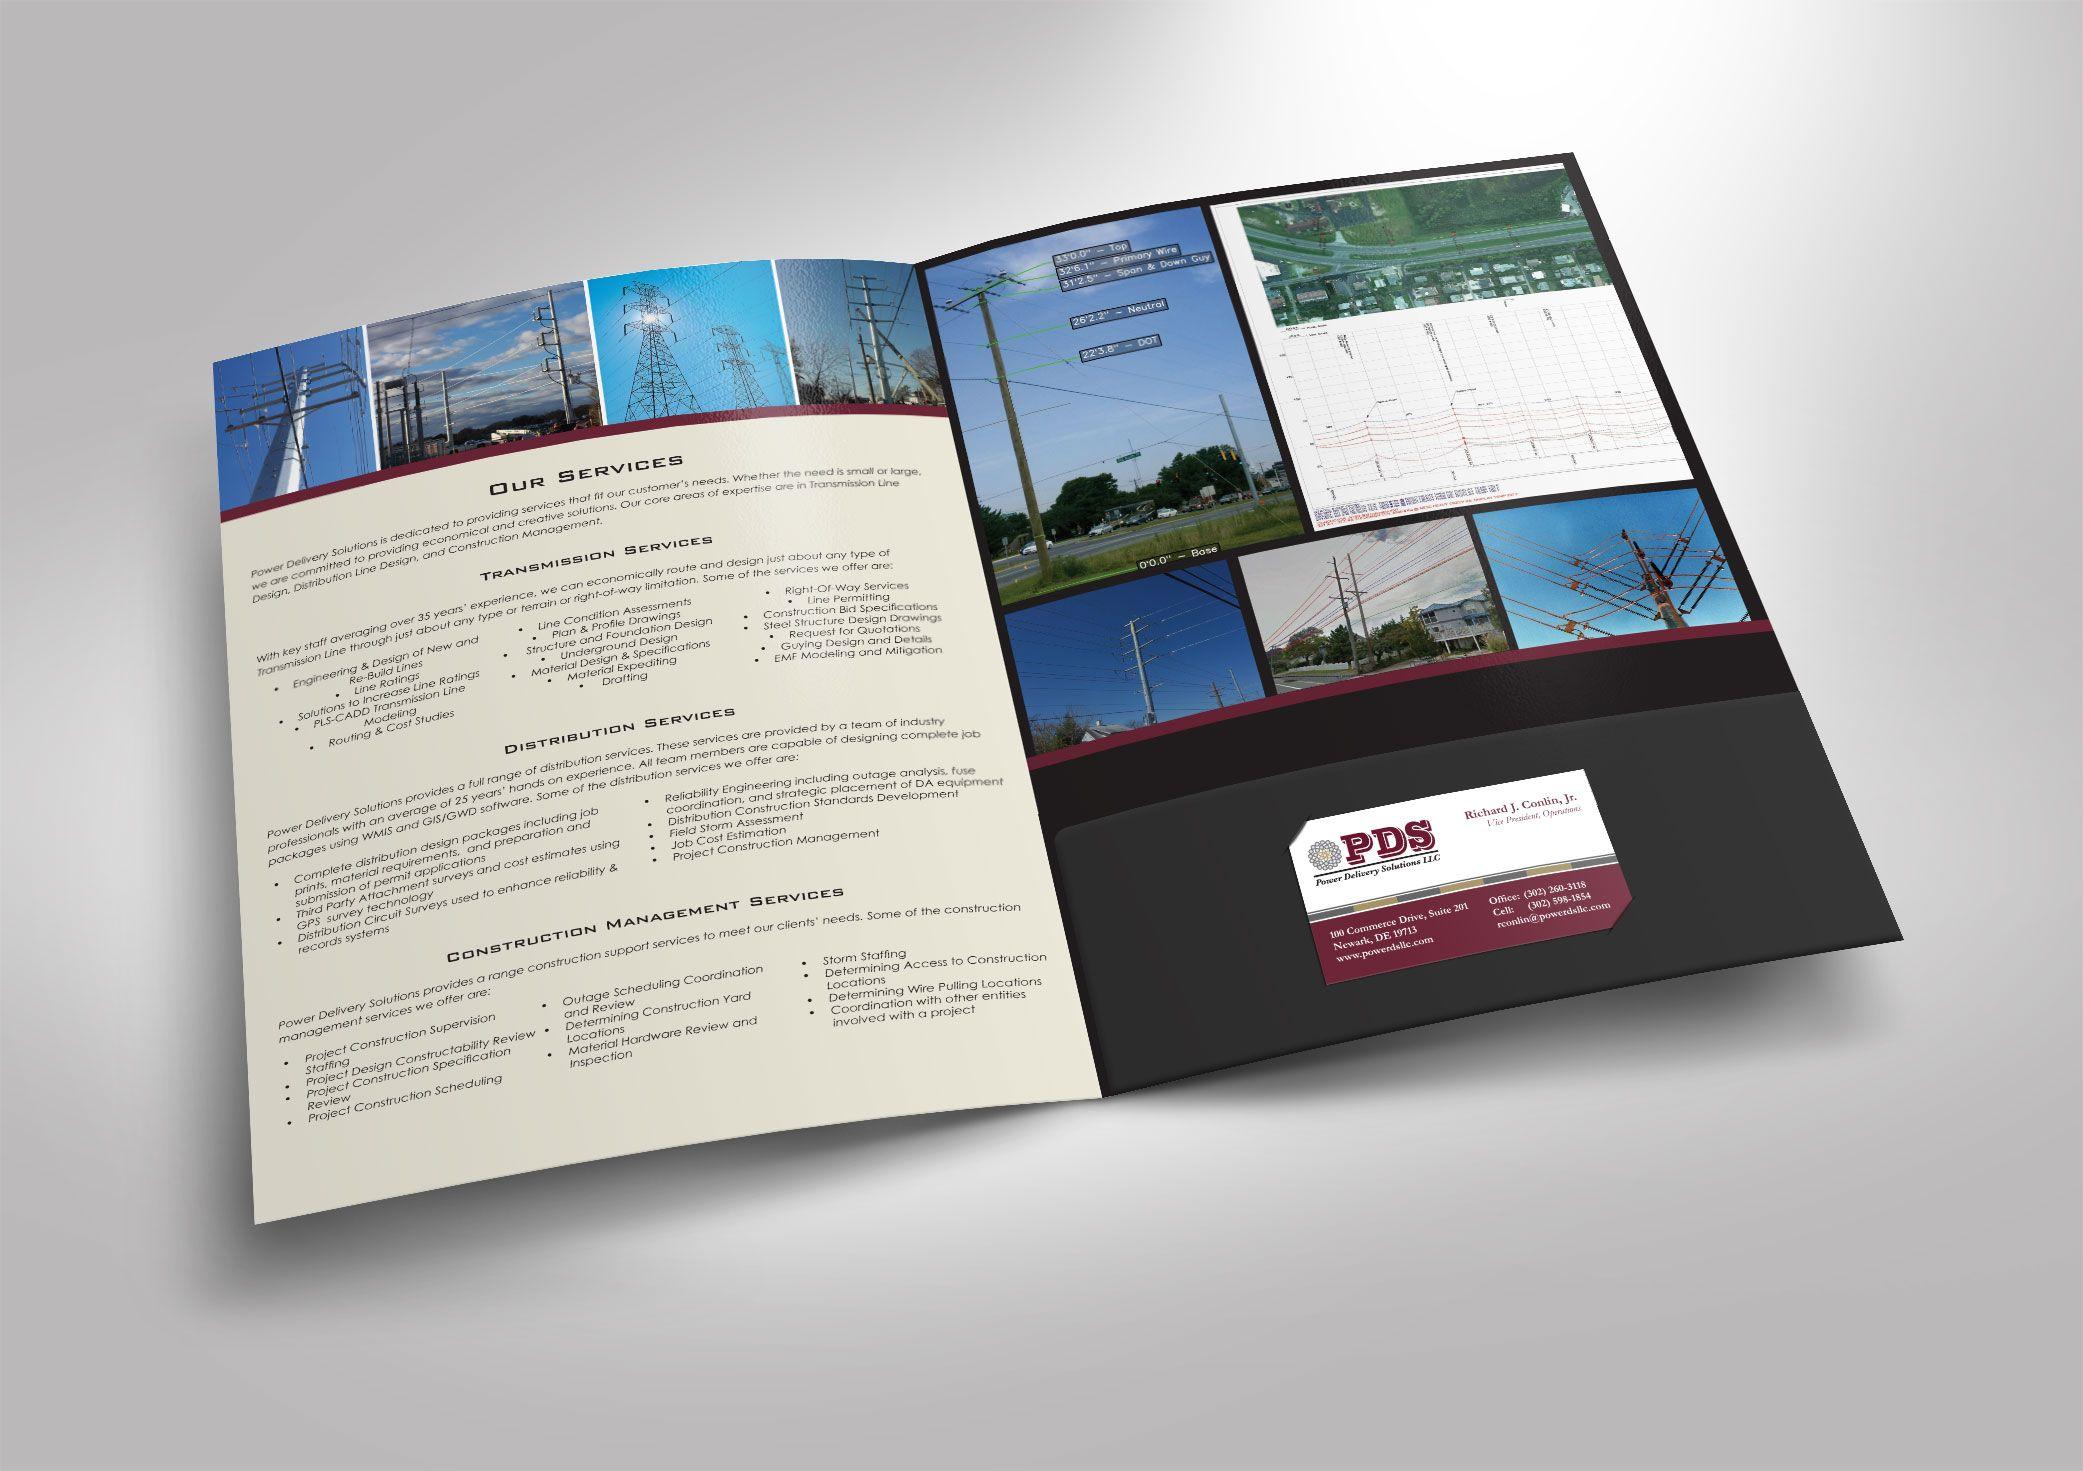 Presentation Folder Design | Business | Pinterest | Presentation ...